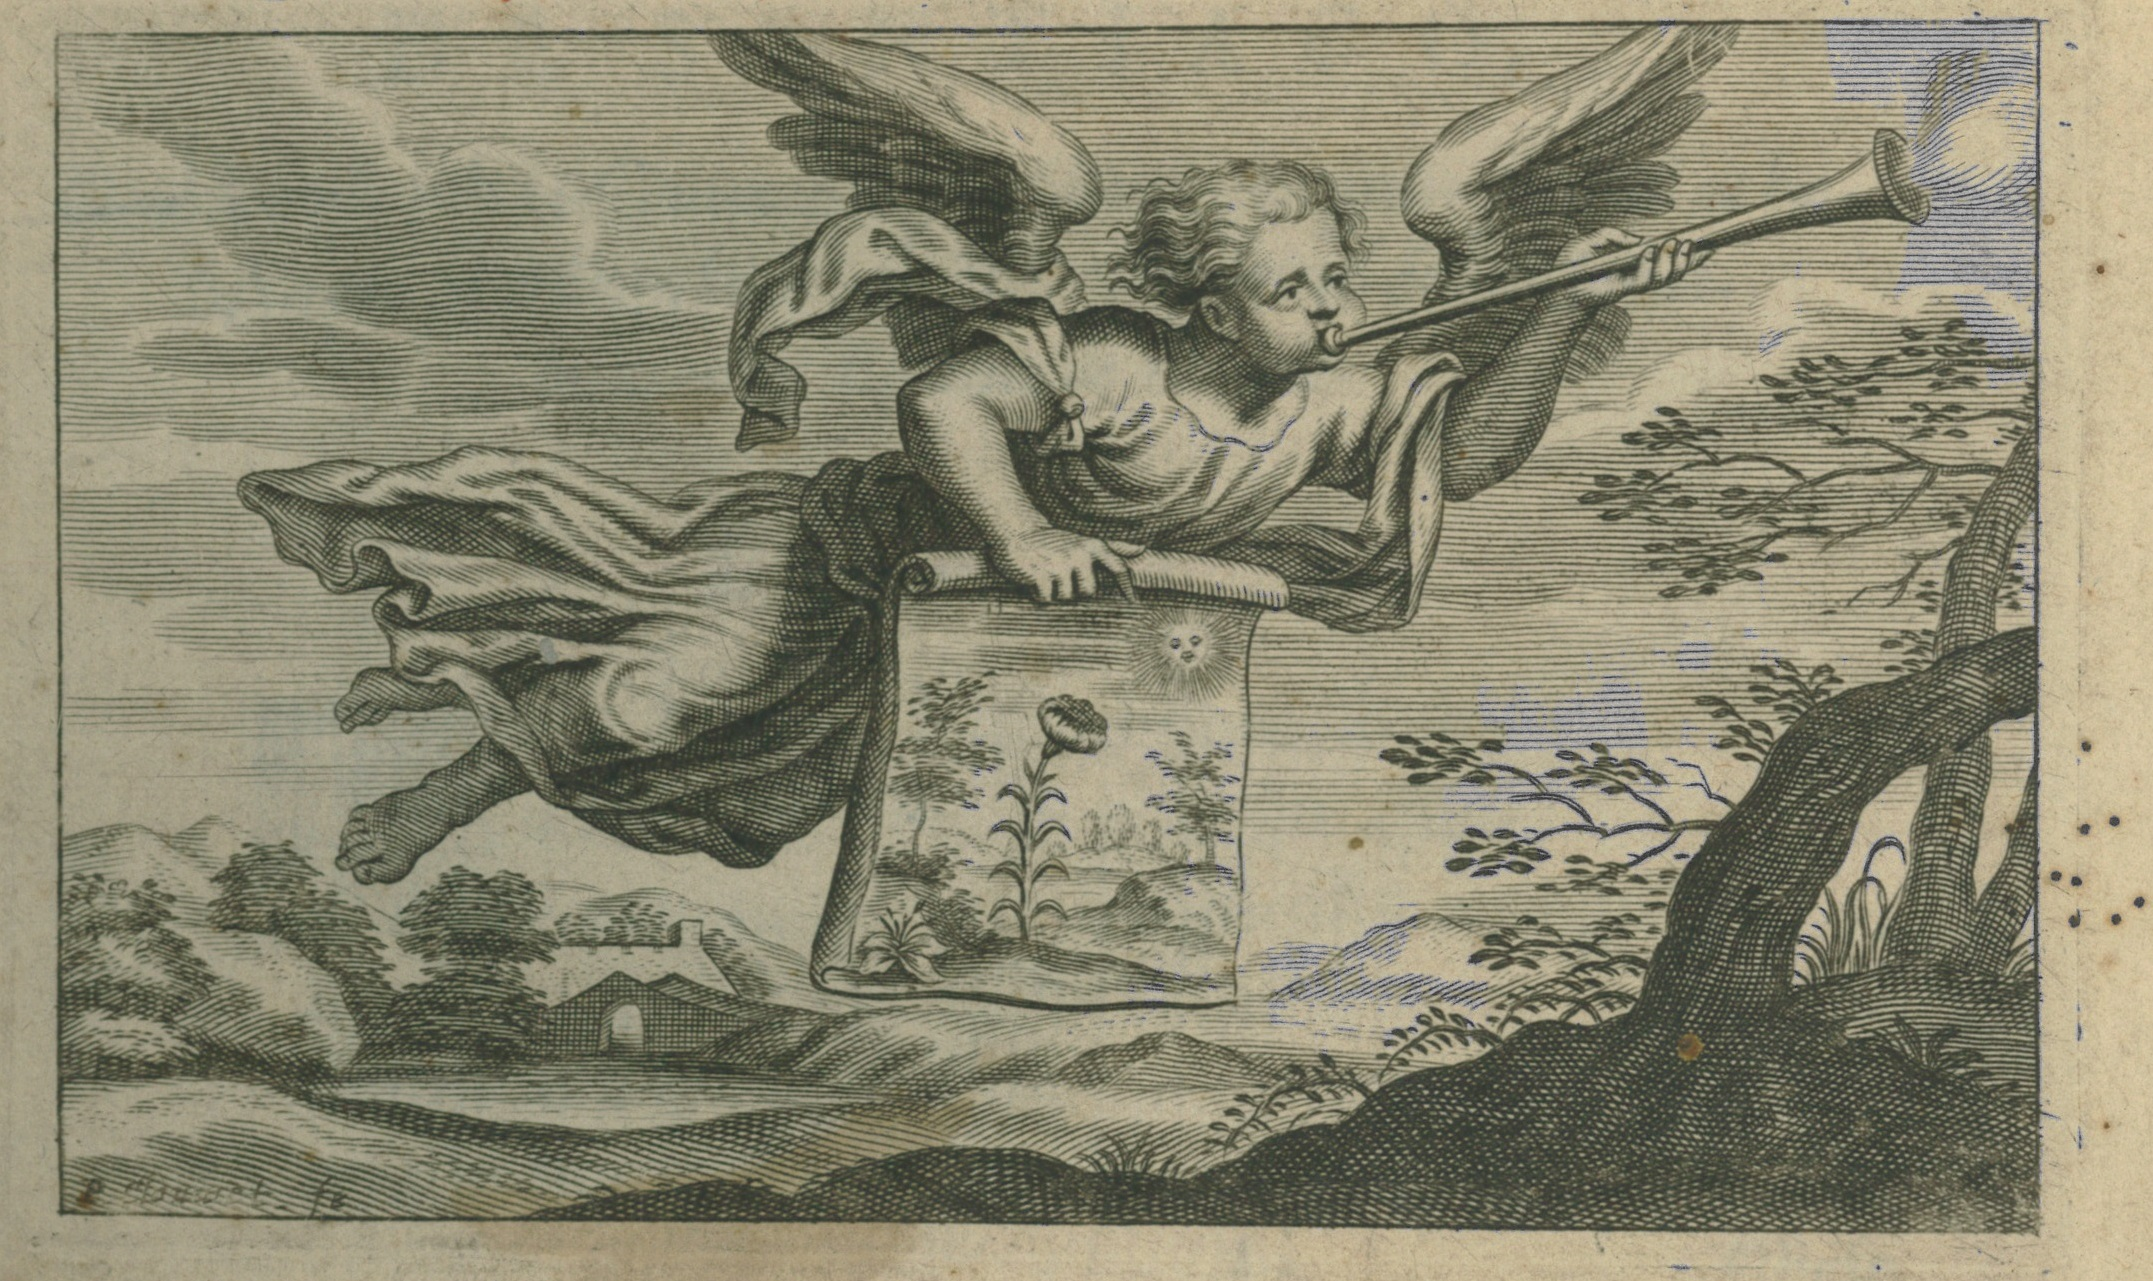 titel page enlarge